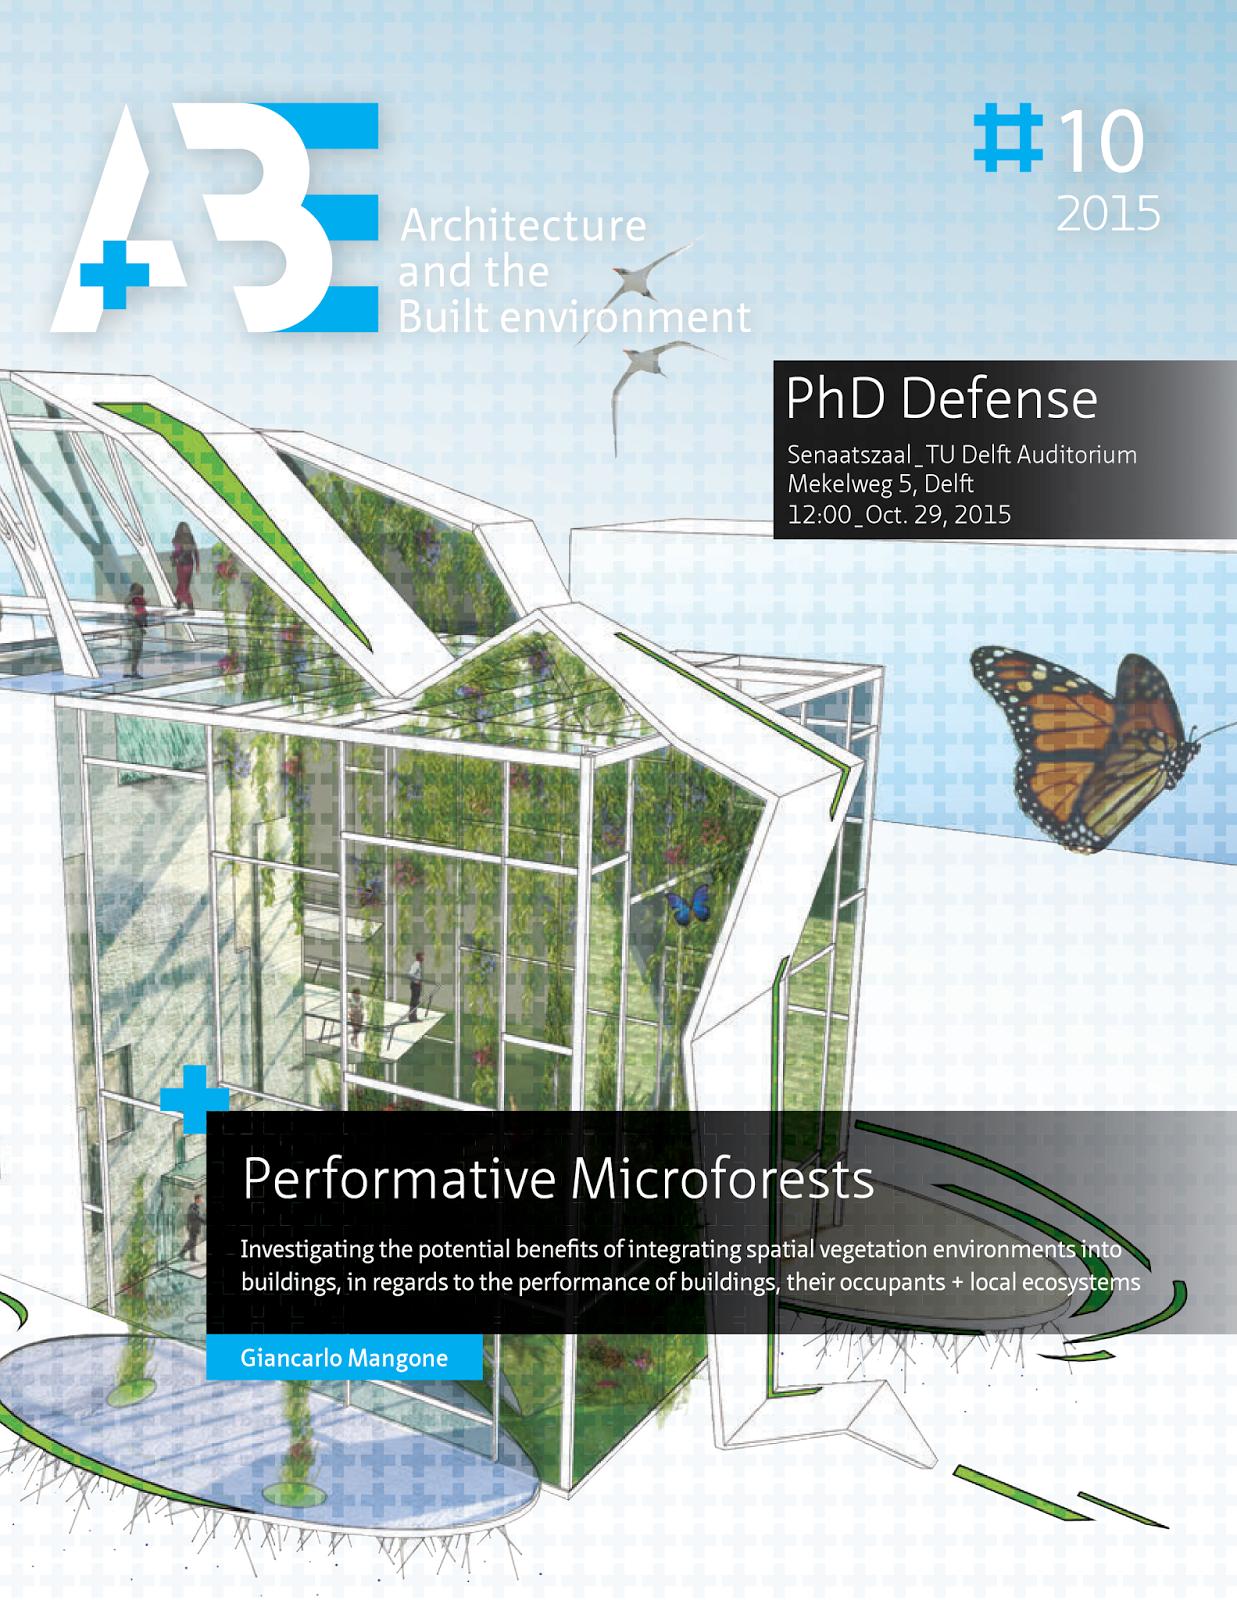 thesis defence presentation outline